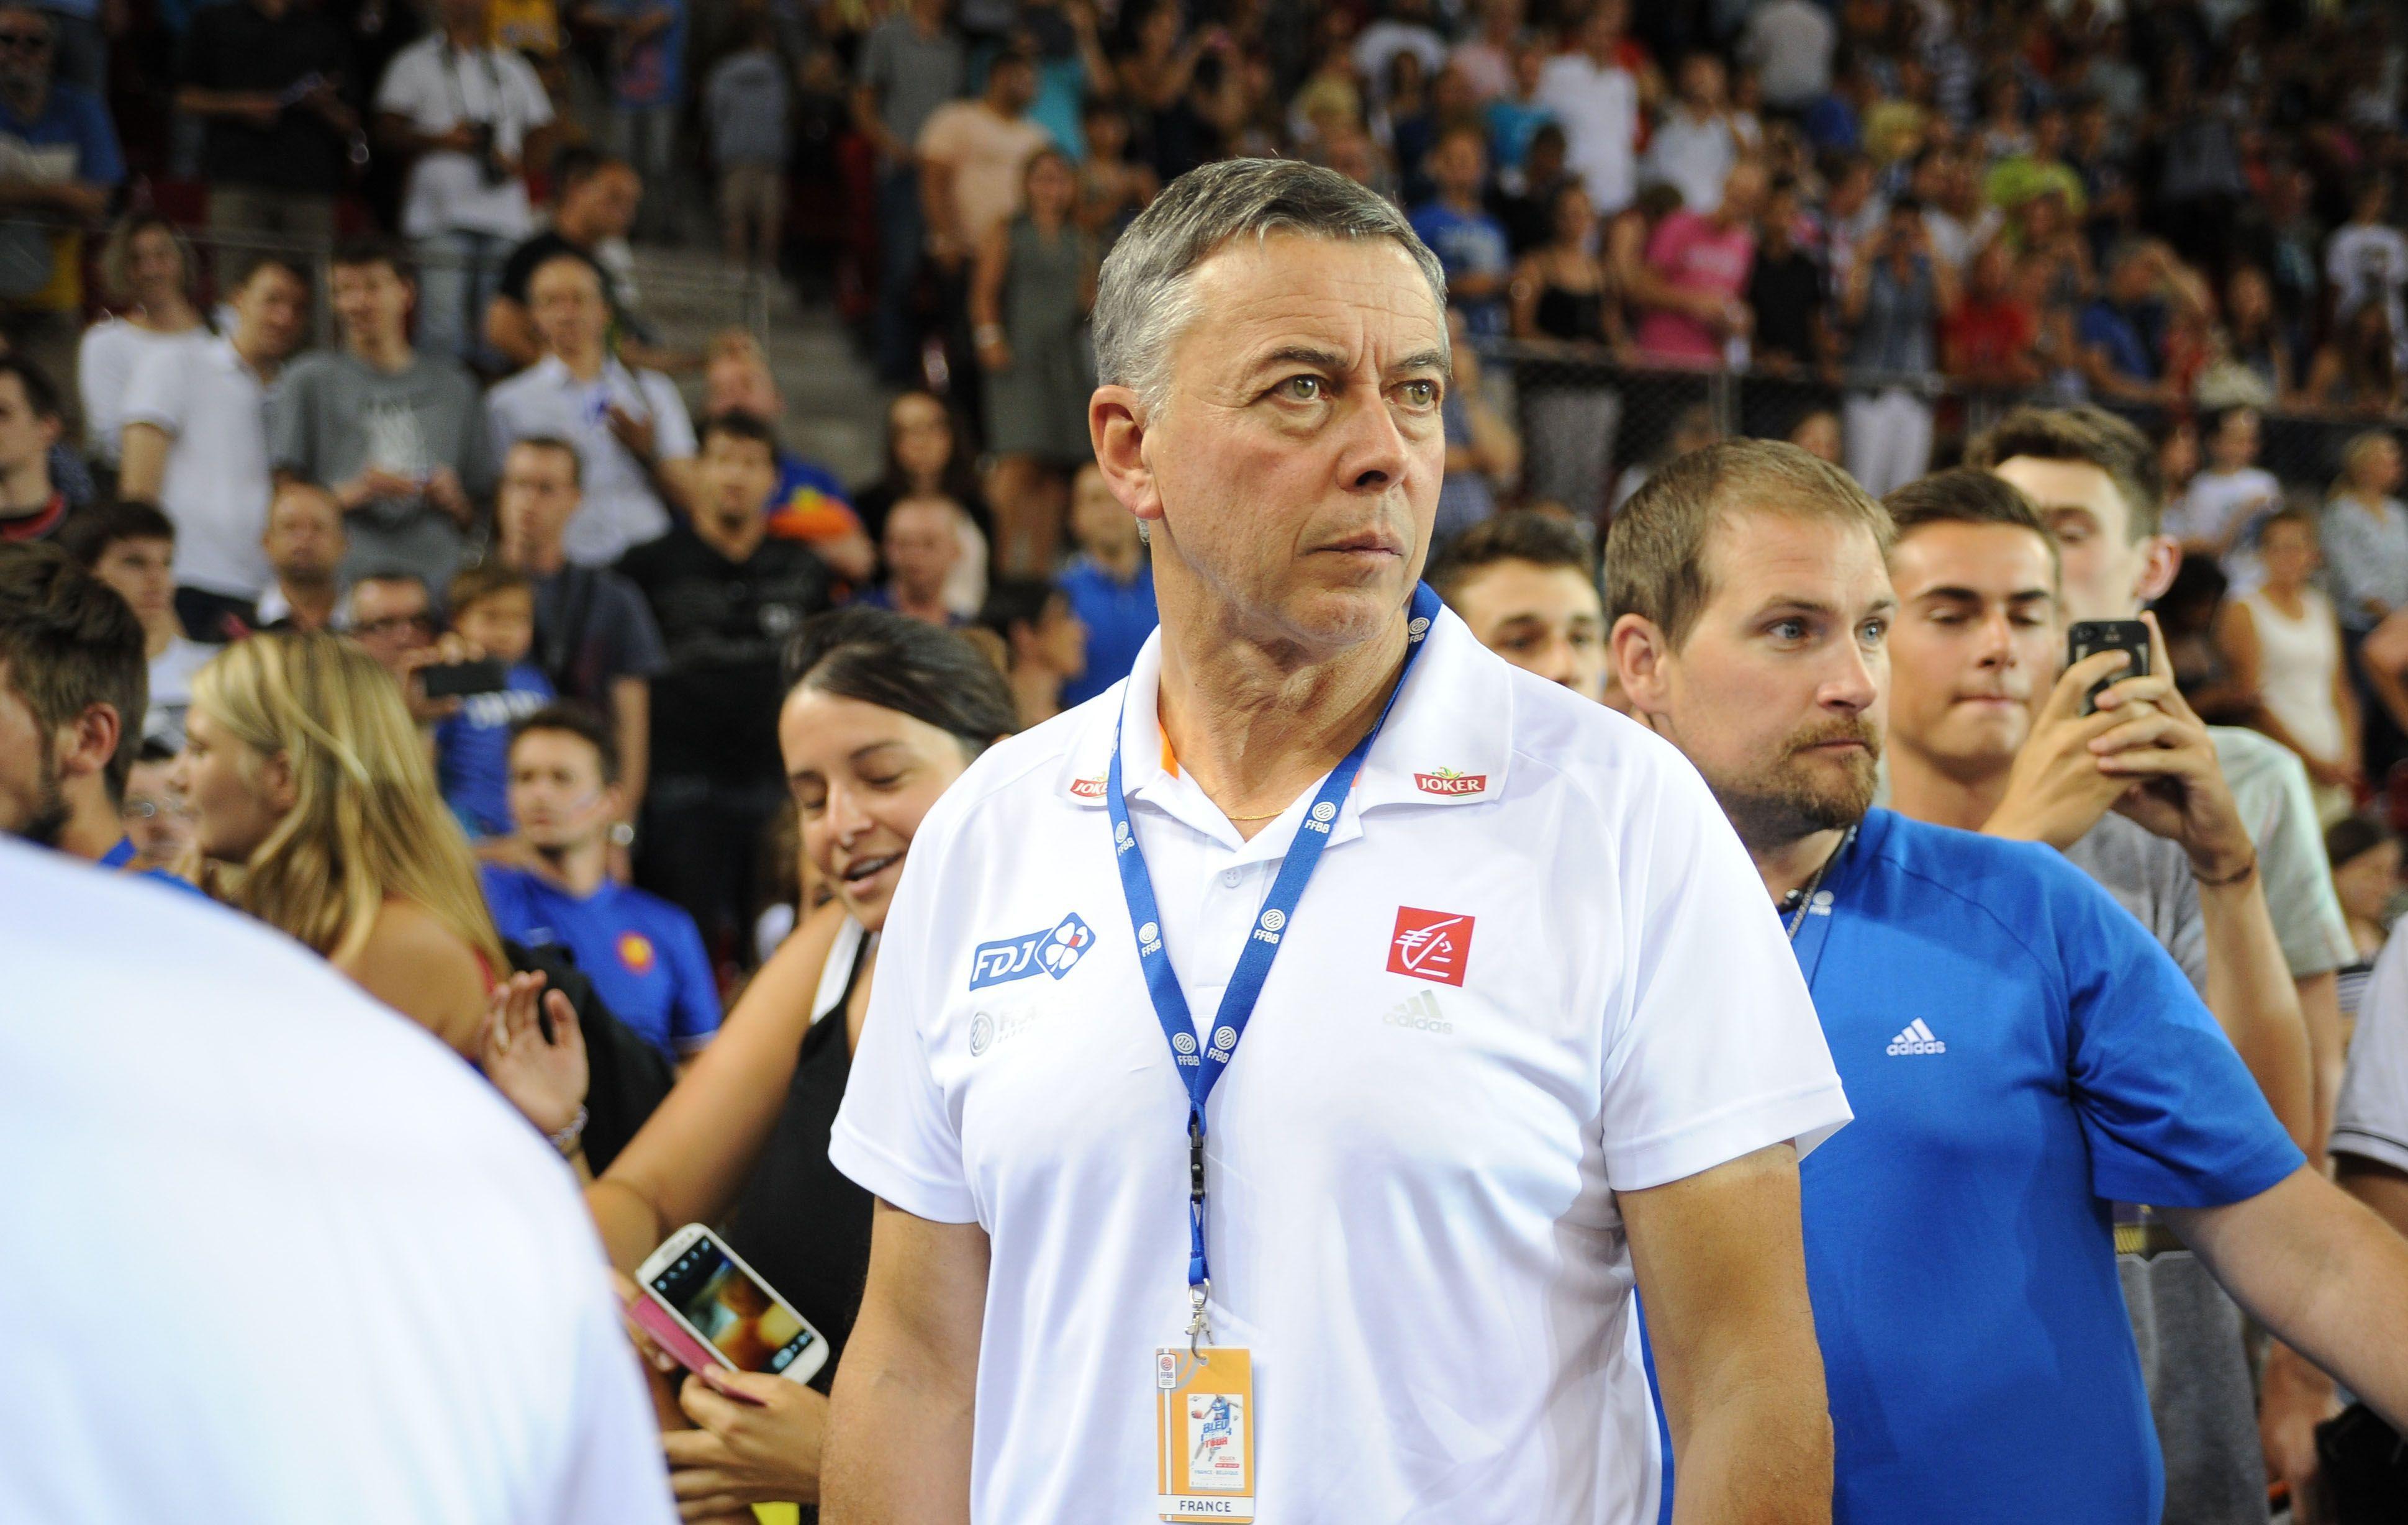 Basket - Equipe de France - Beesley : �Le match des huiti�mes sera terrible�